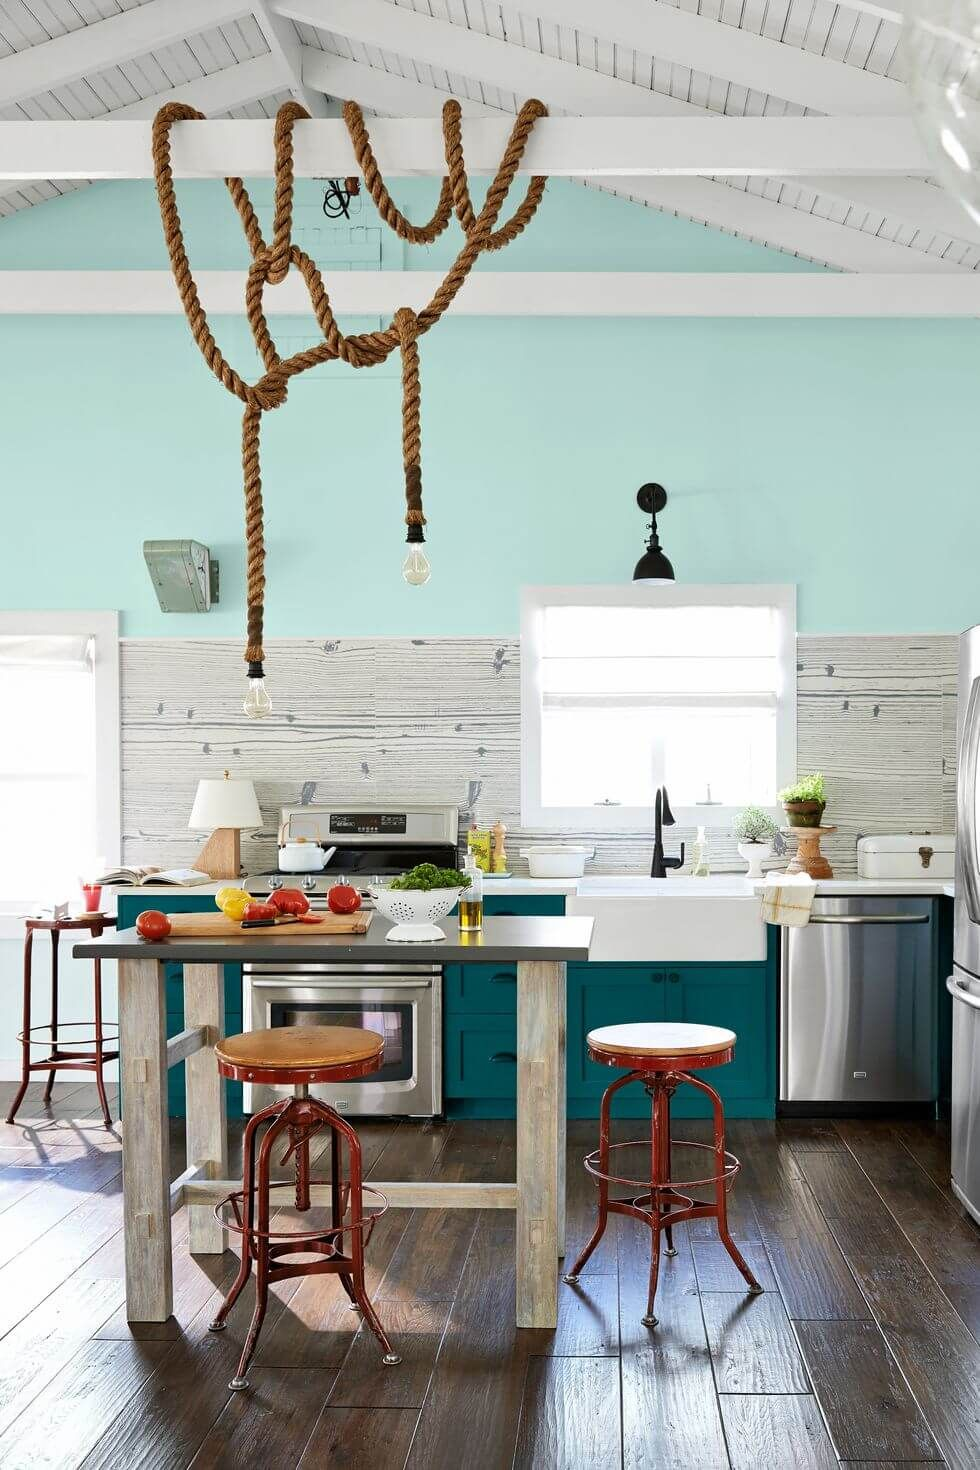 26+ Best Kitchen Remodel Ideas Will Inspire You | Pinterest ...